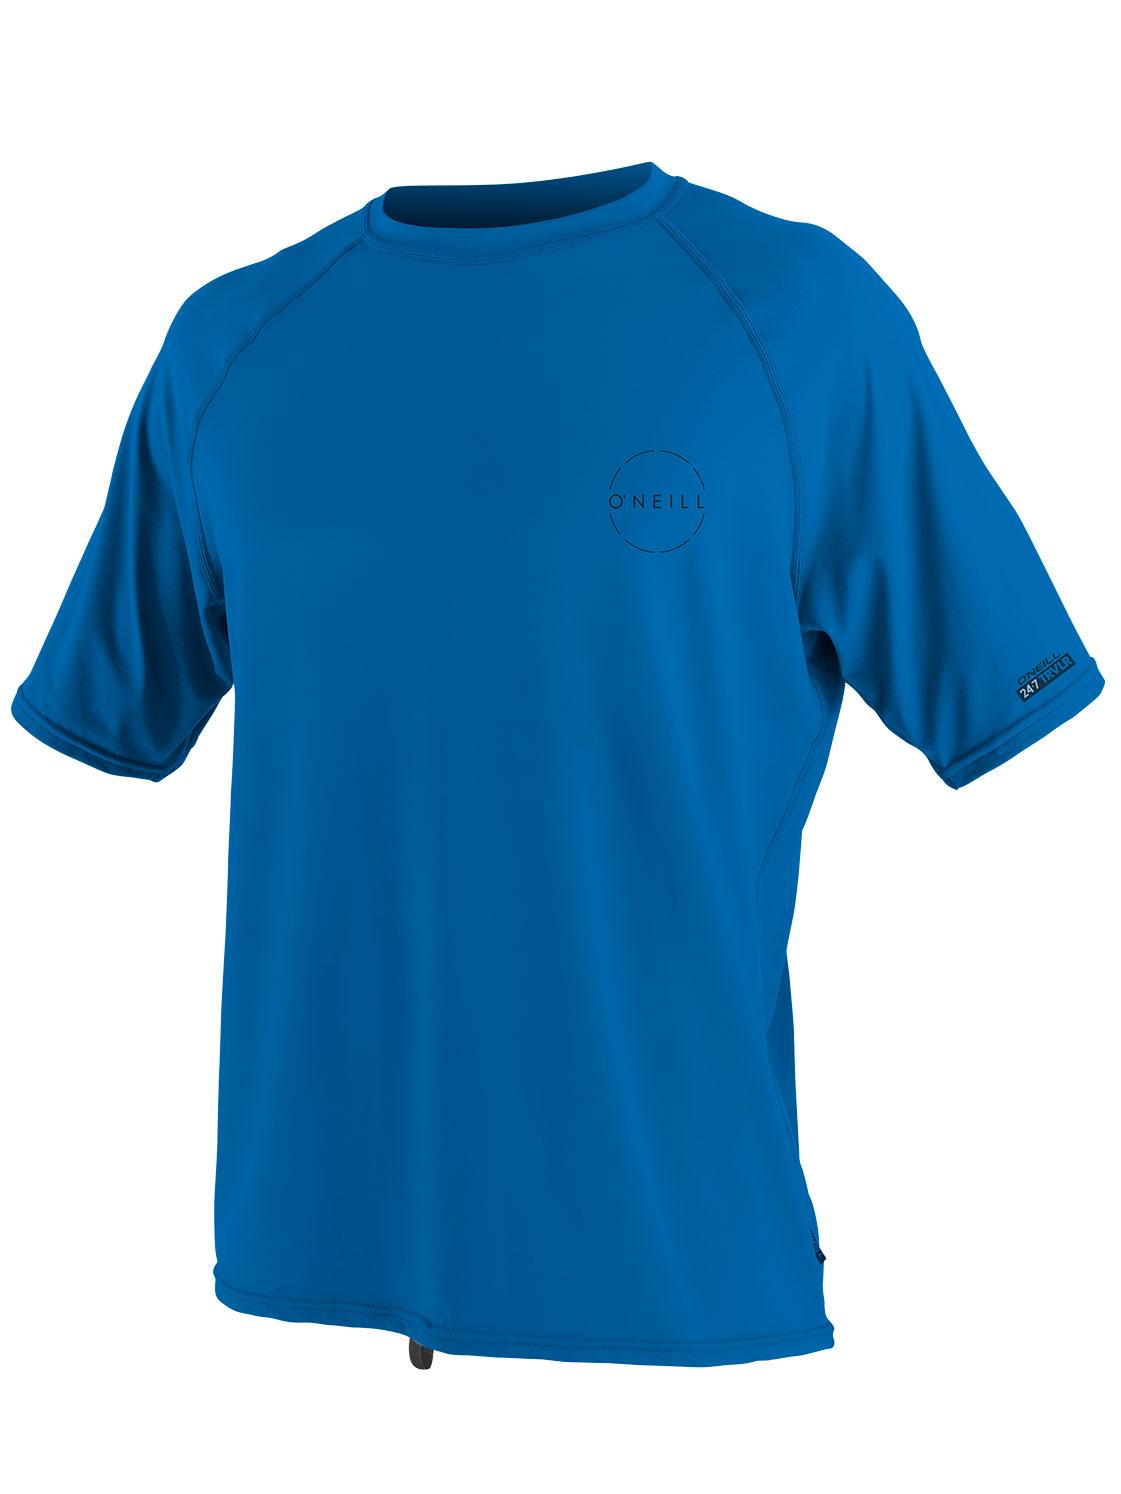 6f8c42c897 Swim Shirts For Sale Near Me